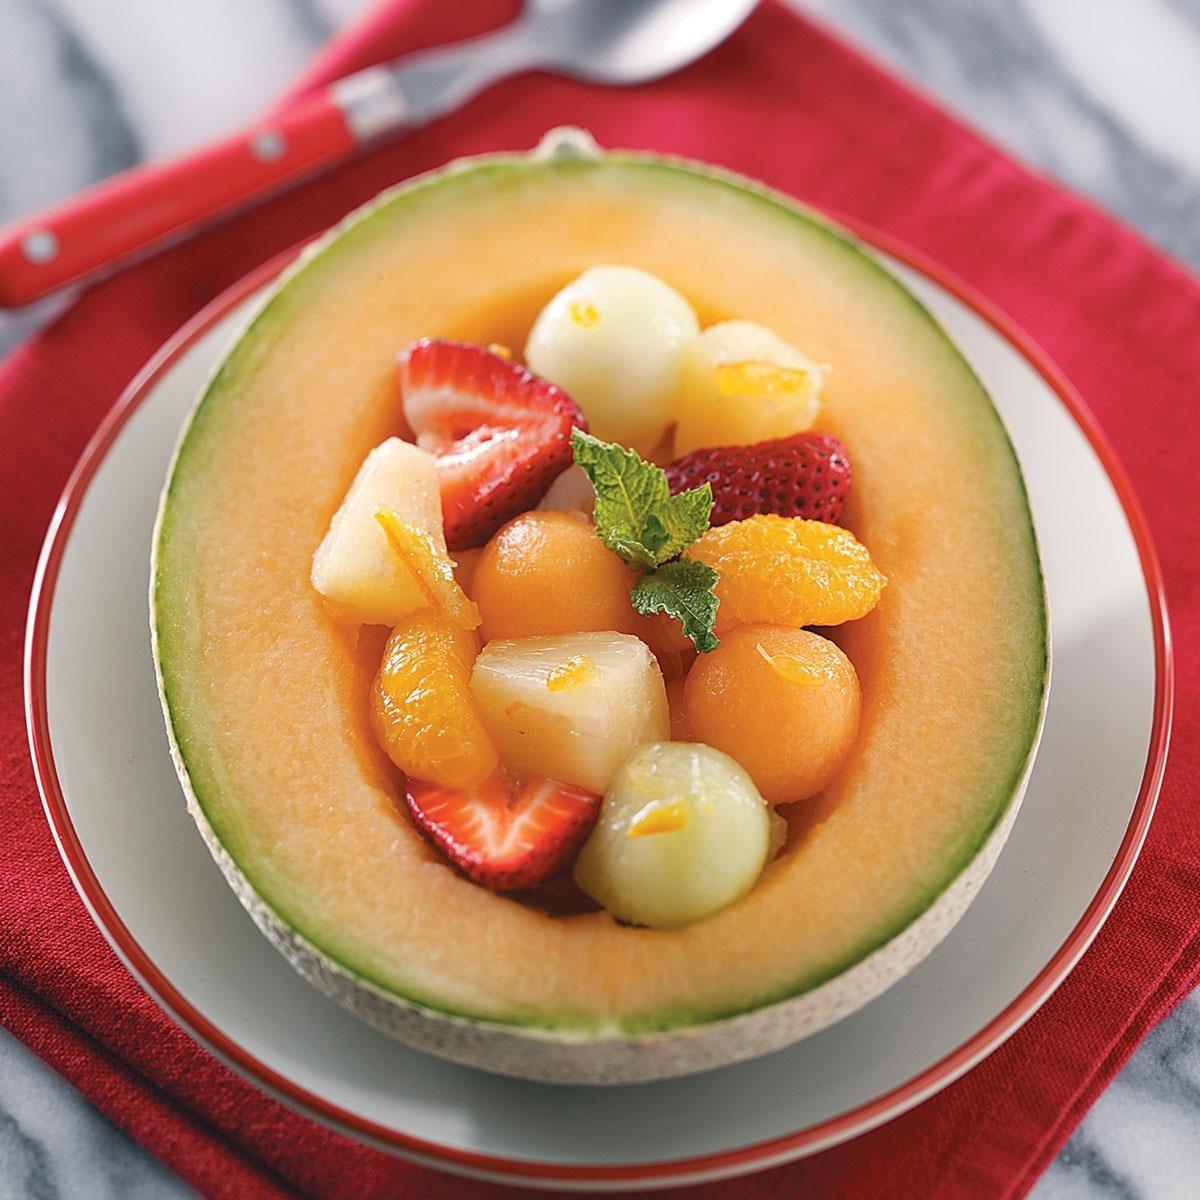 Summertime Melon Salad